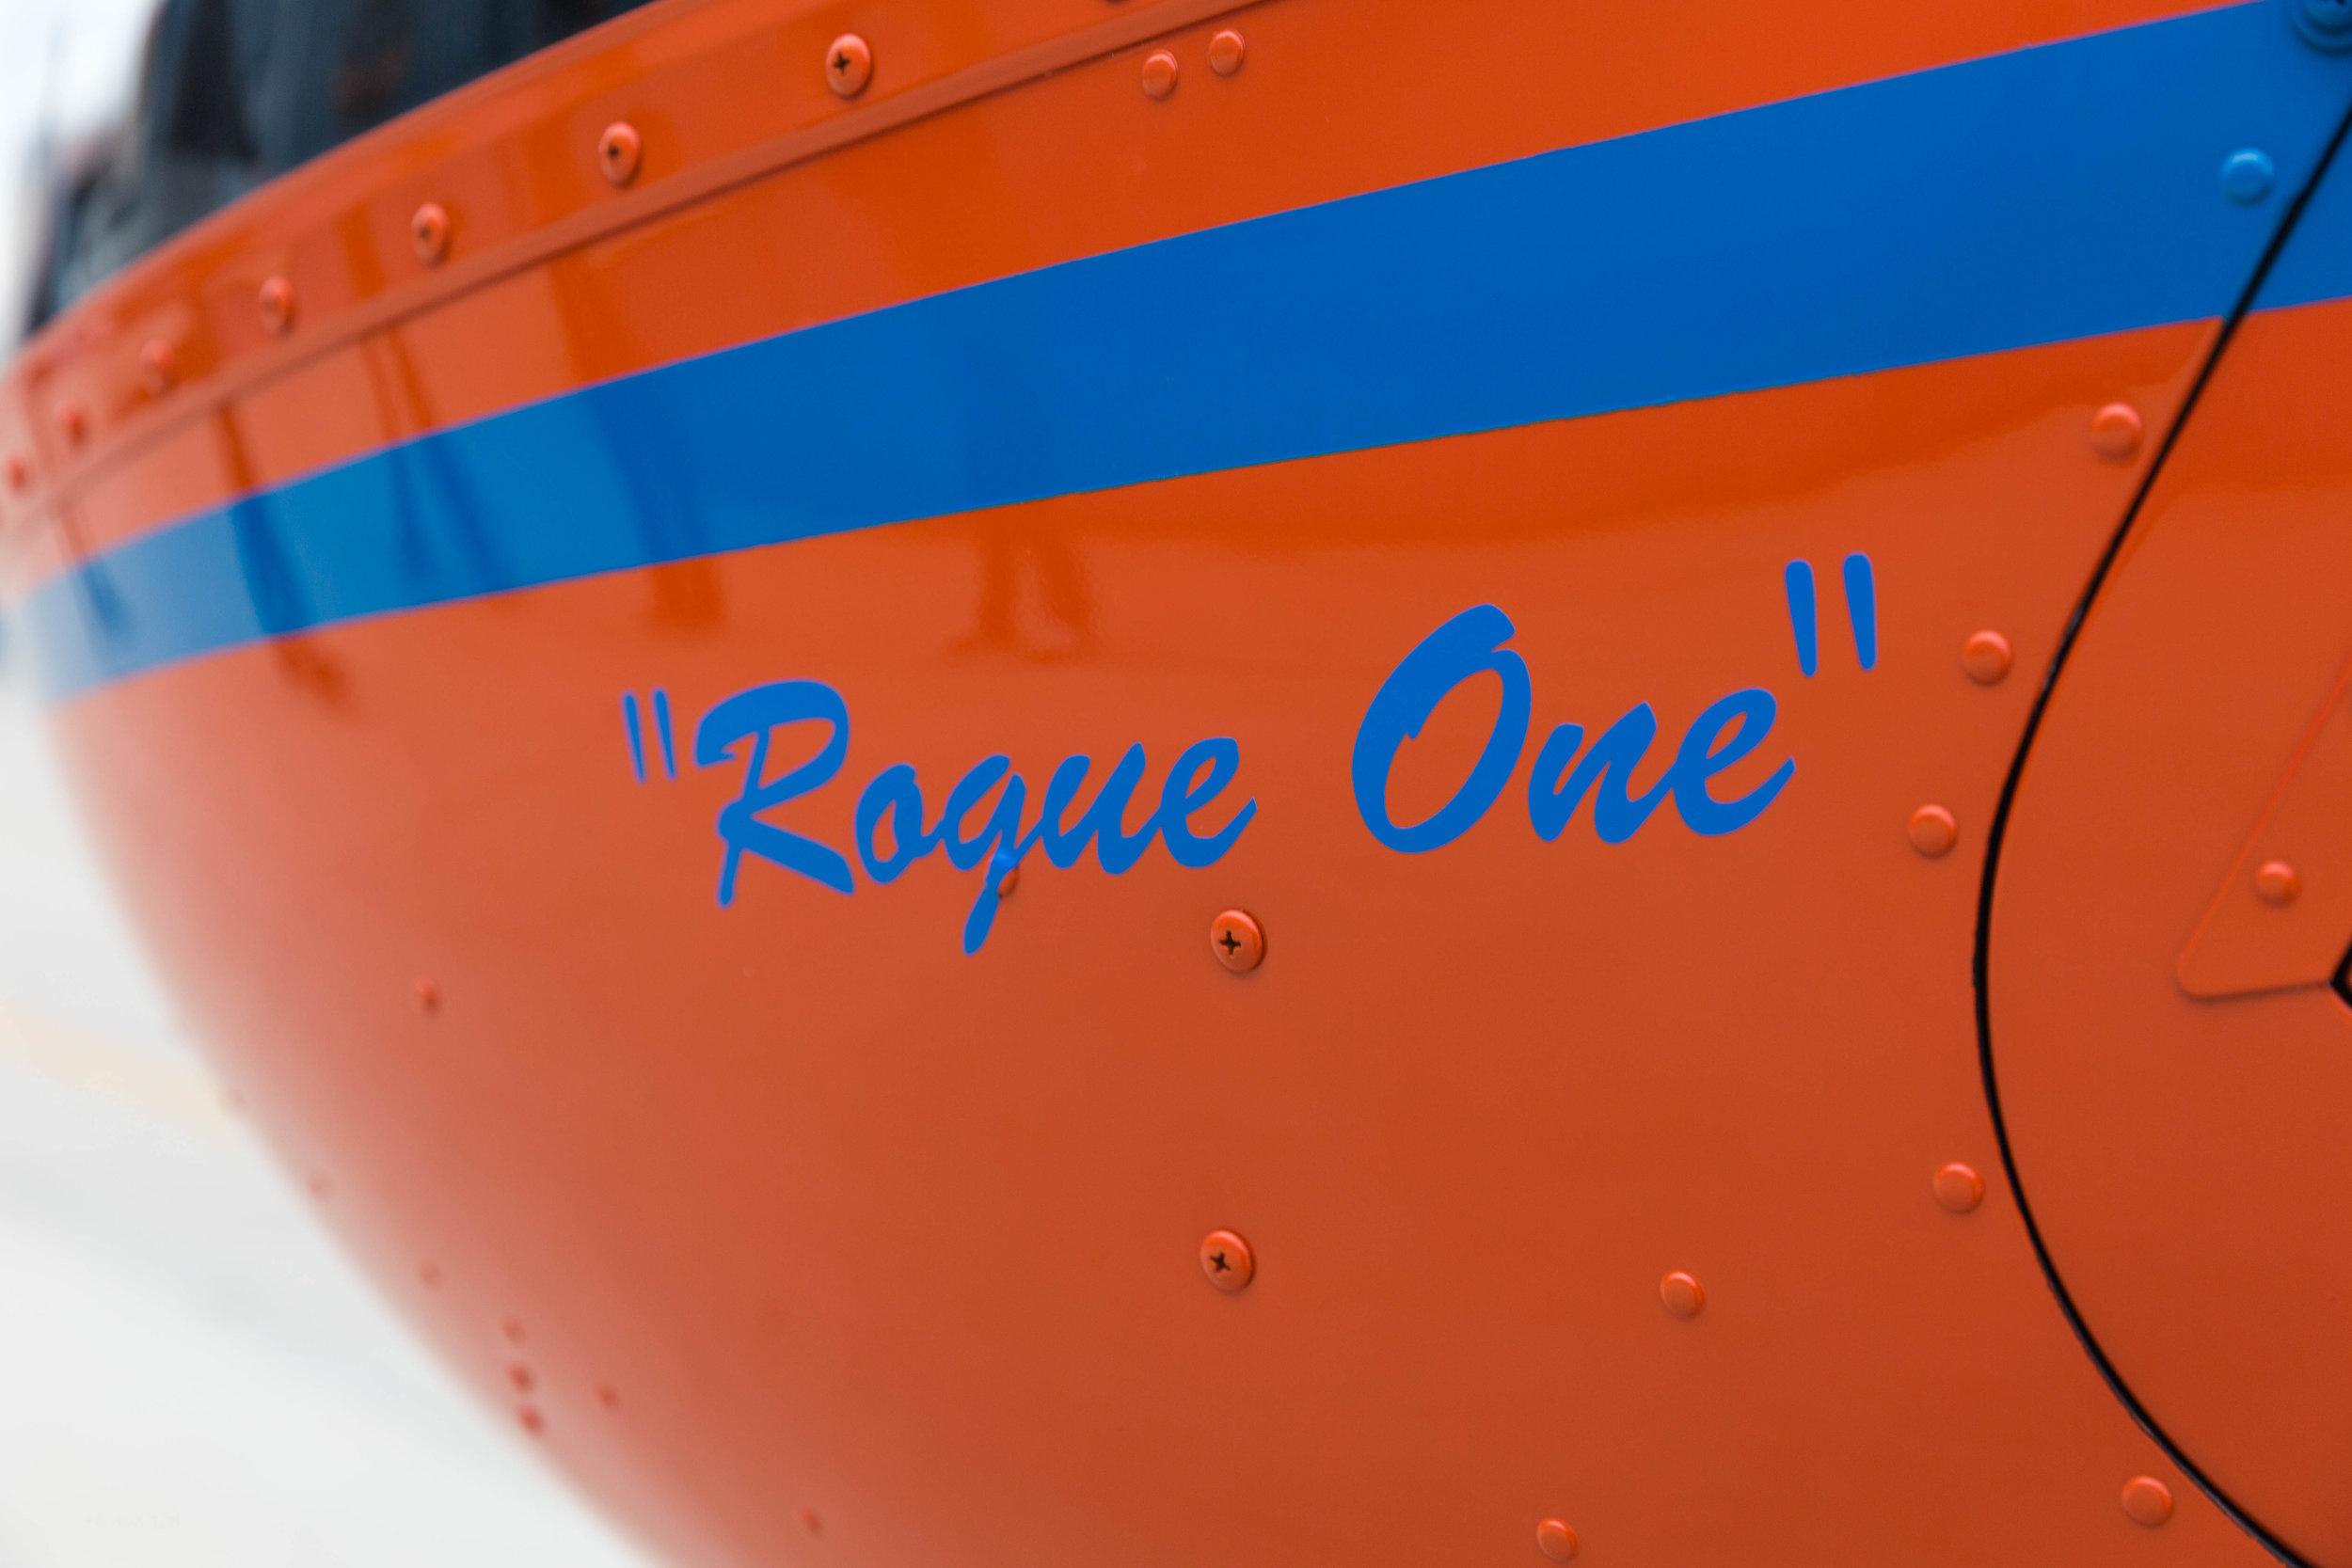 03-20-RogueAviationBlog-1.jpg